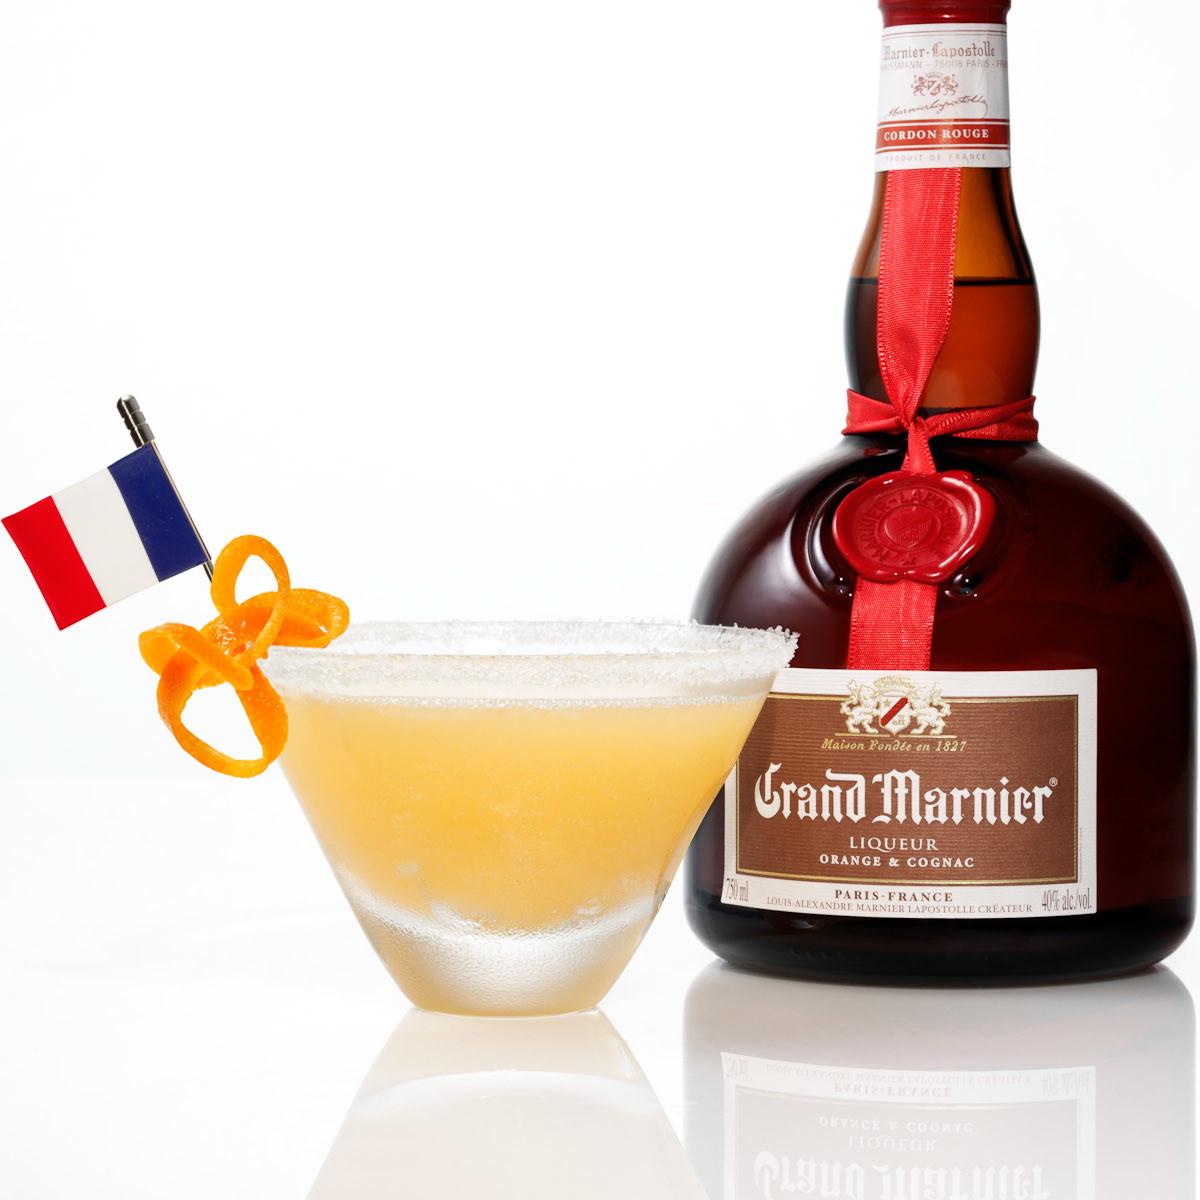 News_alt marg recipes_French Marg_Grand Marnier